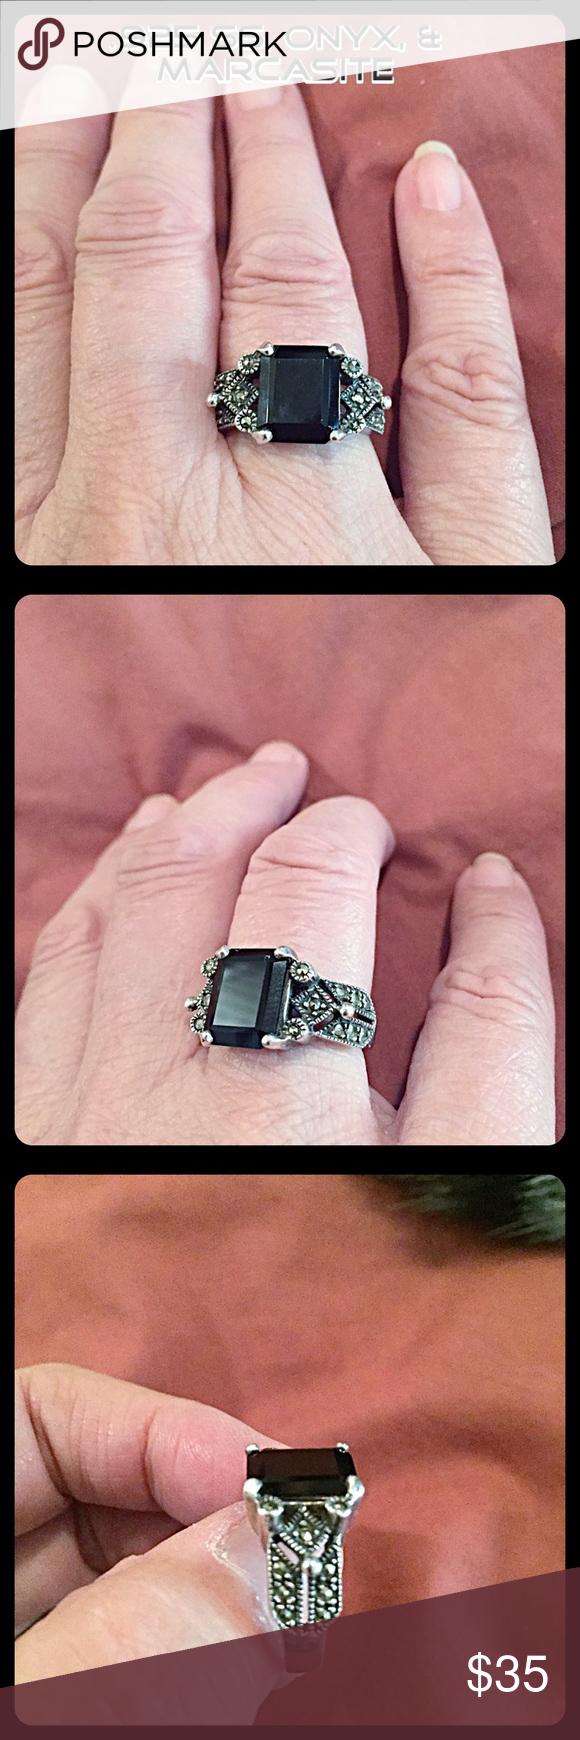 💐VTG. .925 SS, Onyx, & Marcasite Ring💐 | Marcasite ring, Marcasite ...